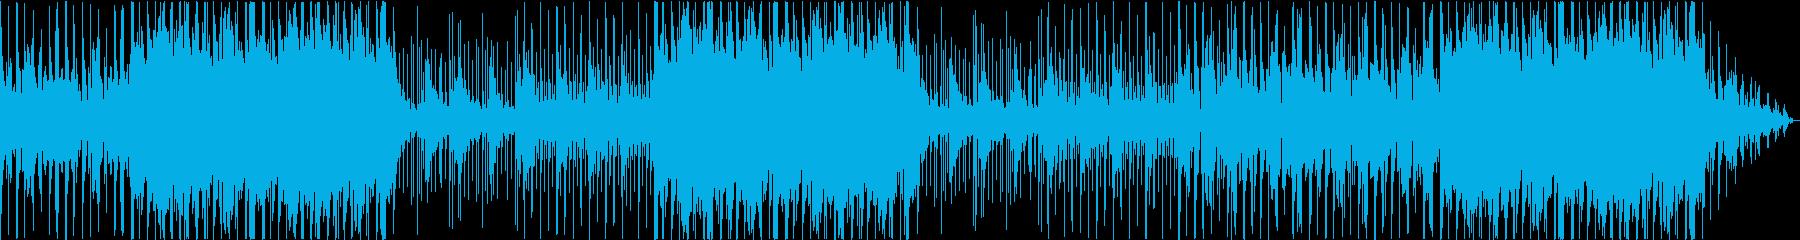 Guitar, electric piano, Lofi, adult, cafe's reproduced waveform